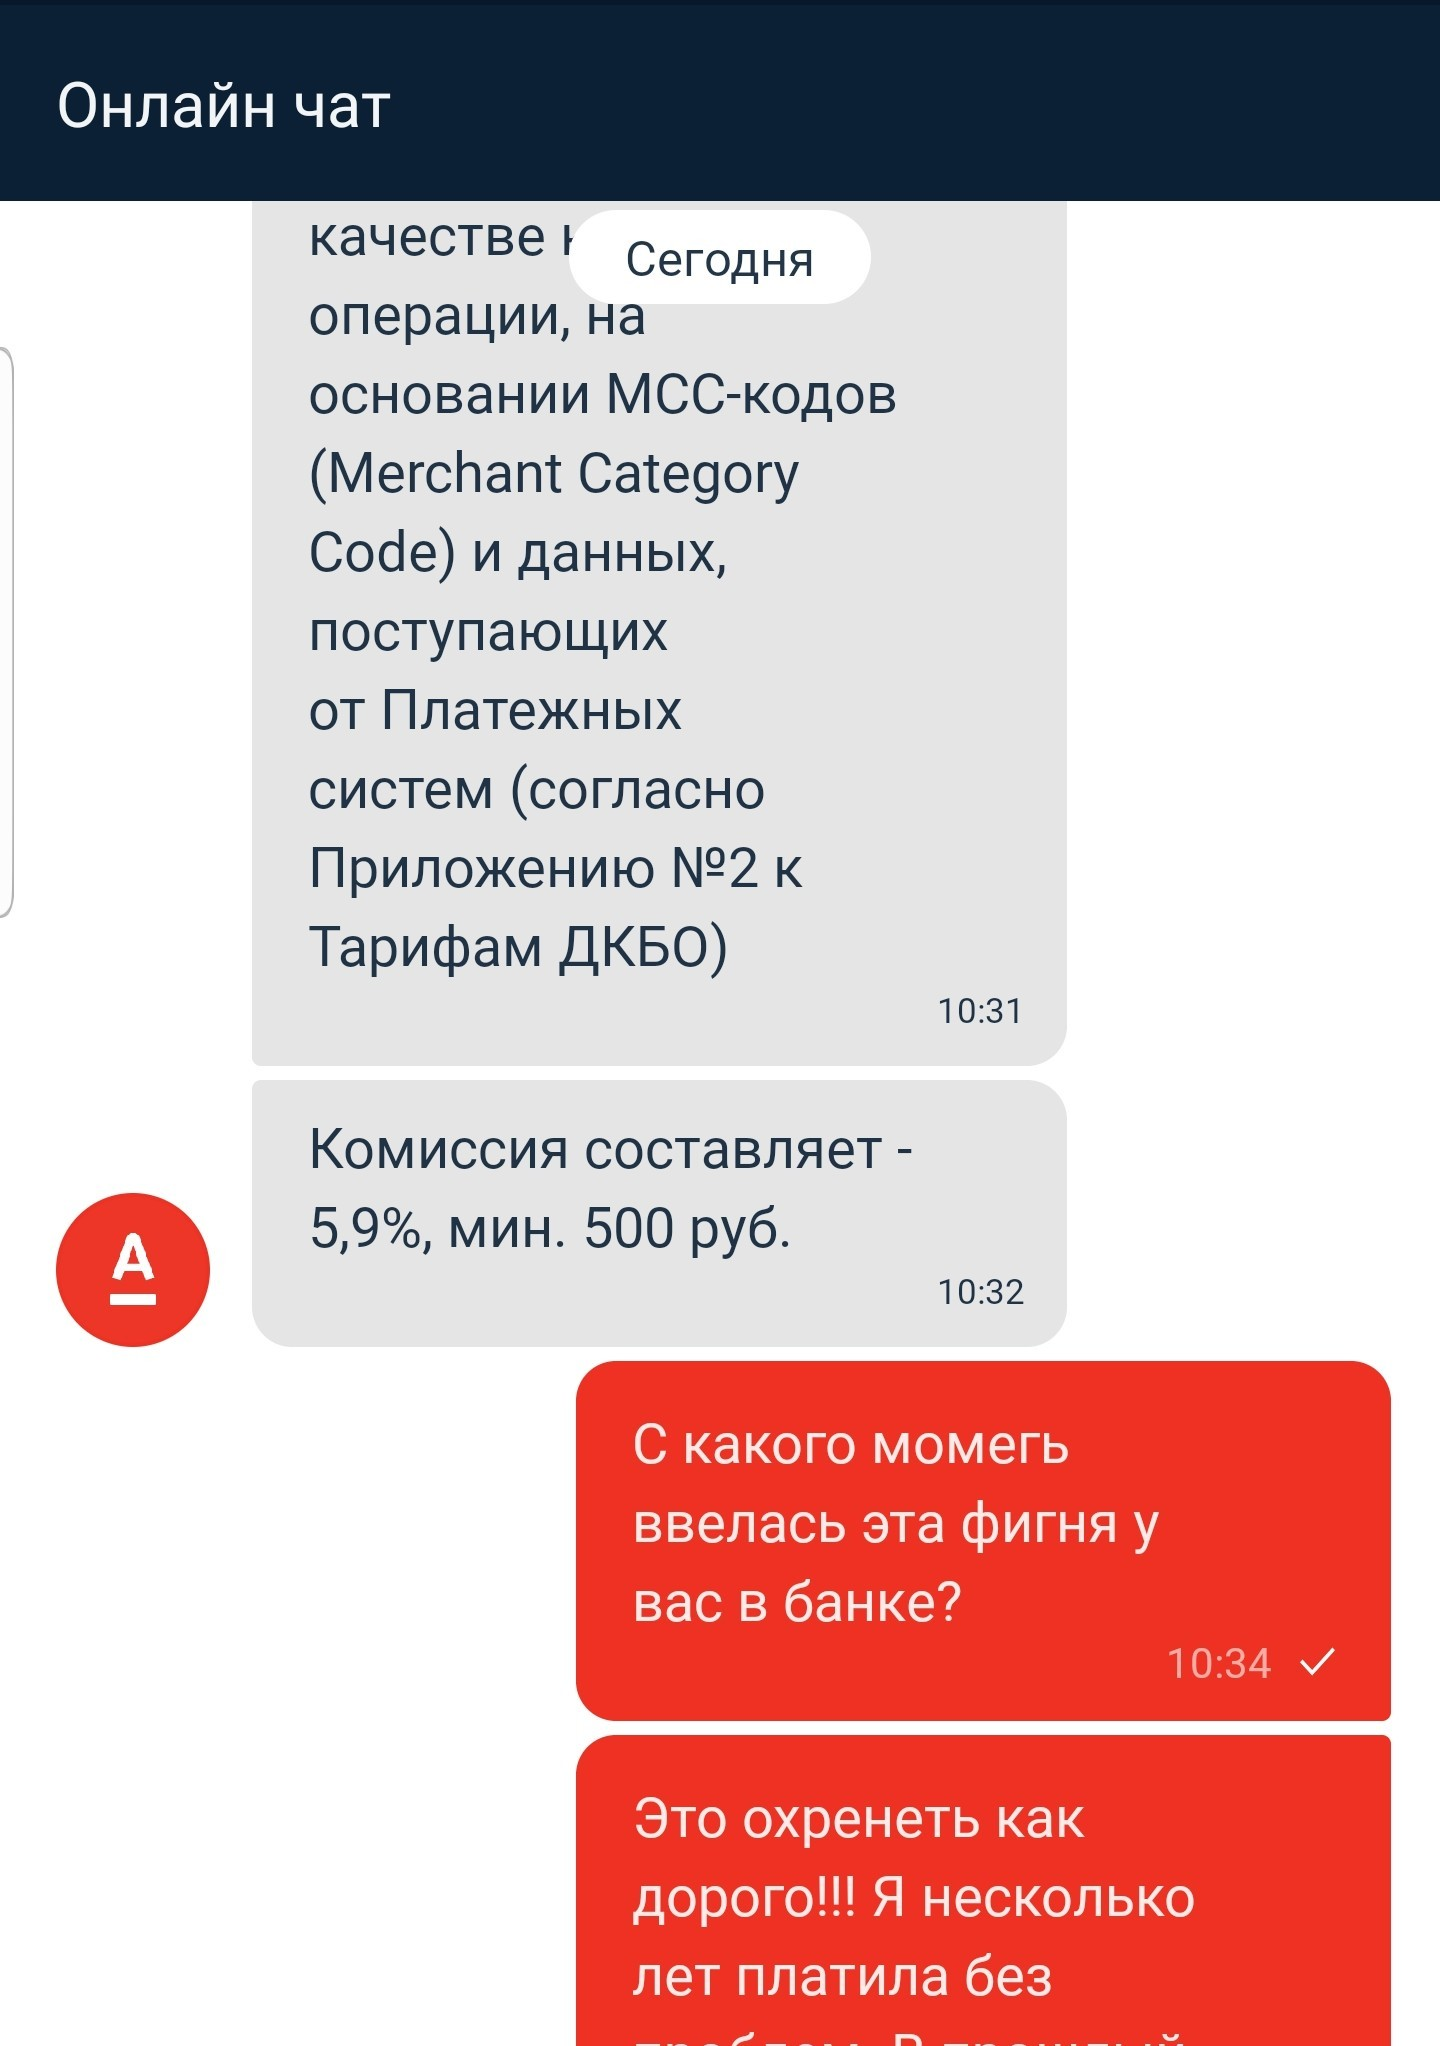 Онлайн банк альфа банк тверь